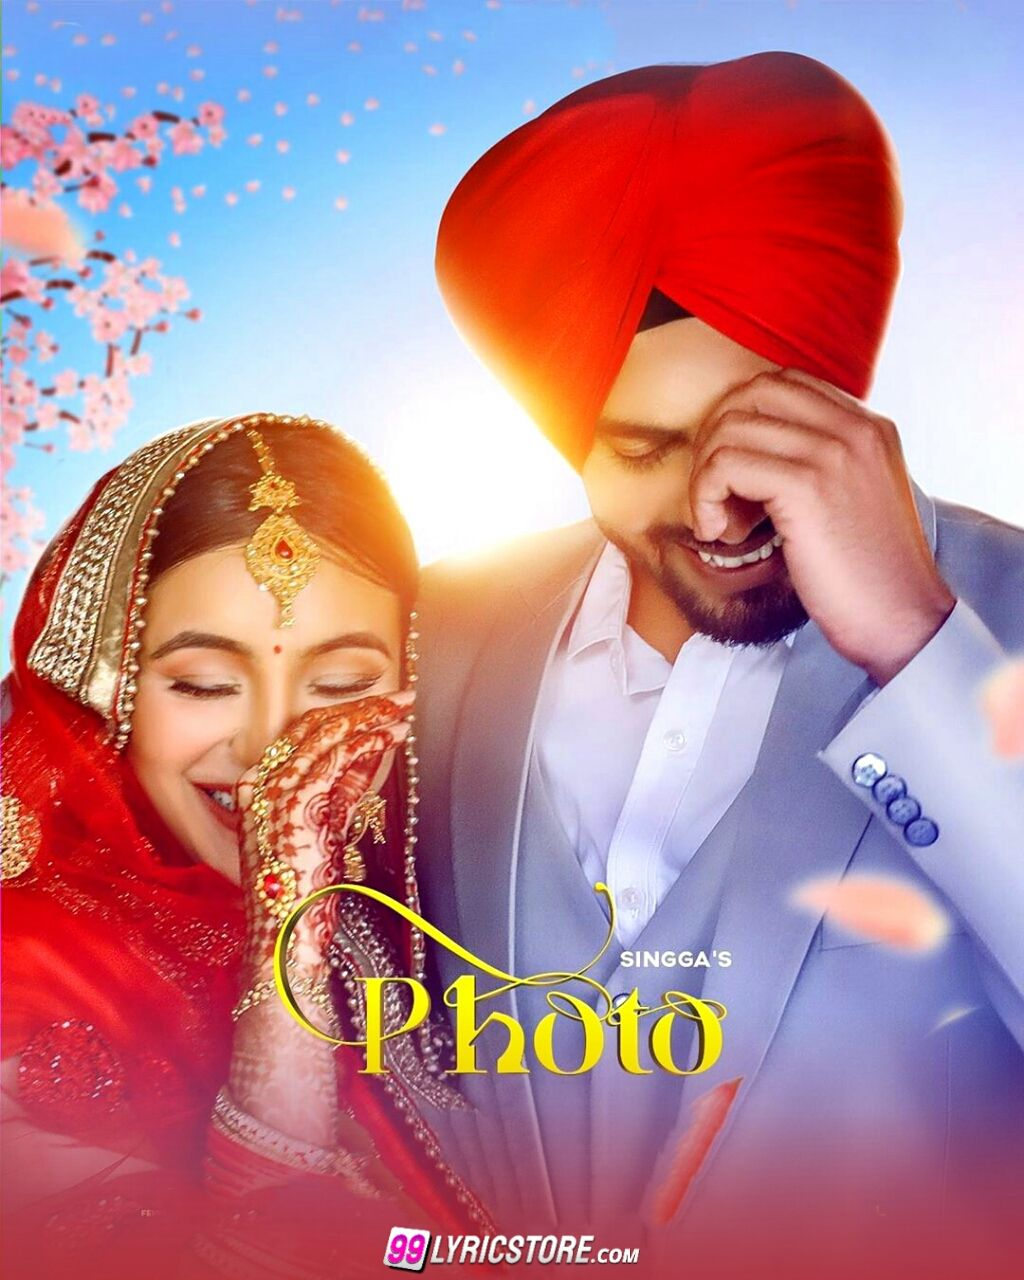 Photo punjabi sad song lyrics sung by Singaa ft. Nikki Kaur